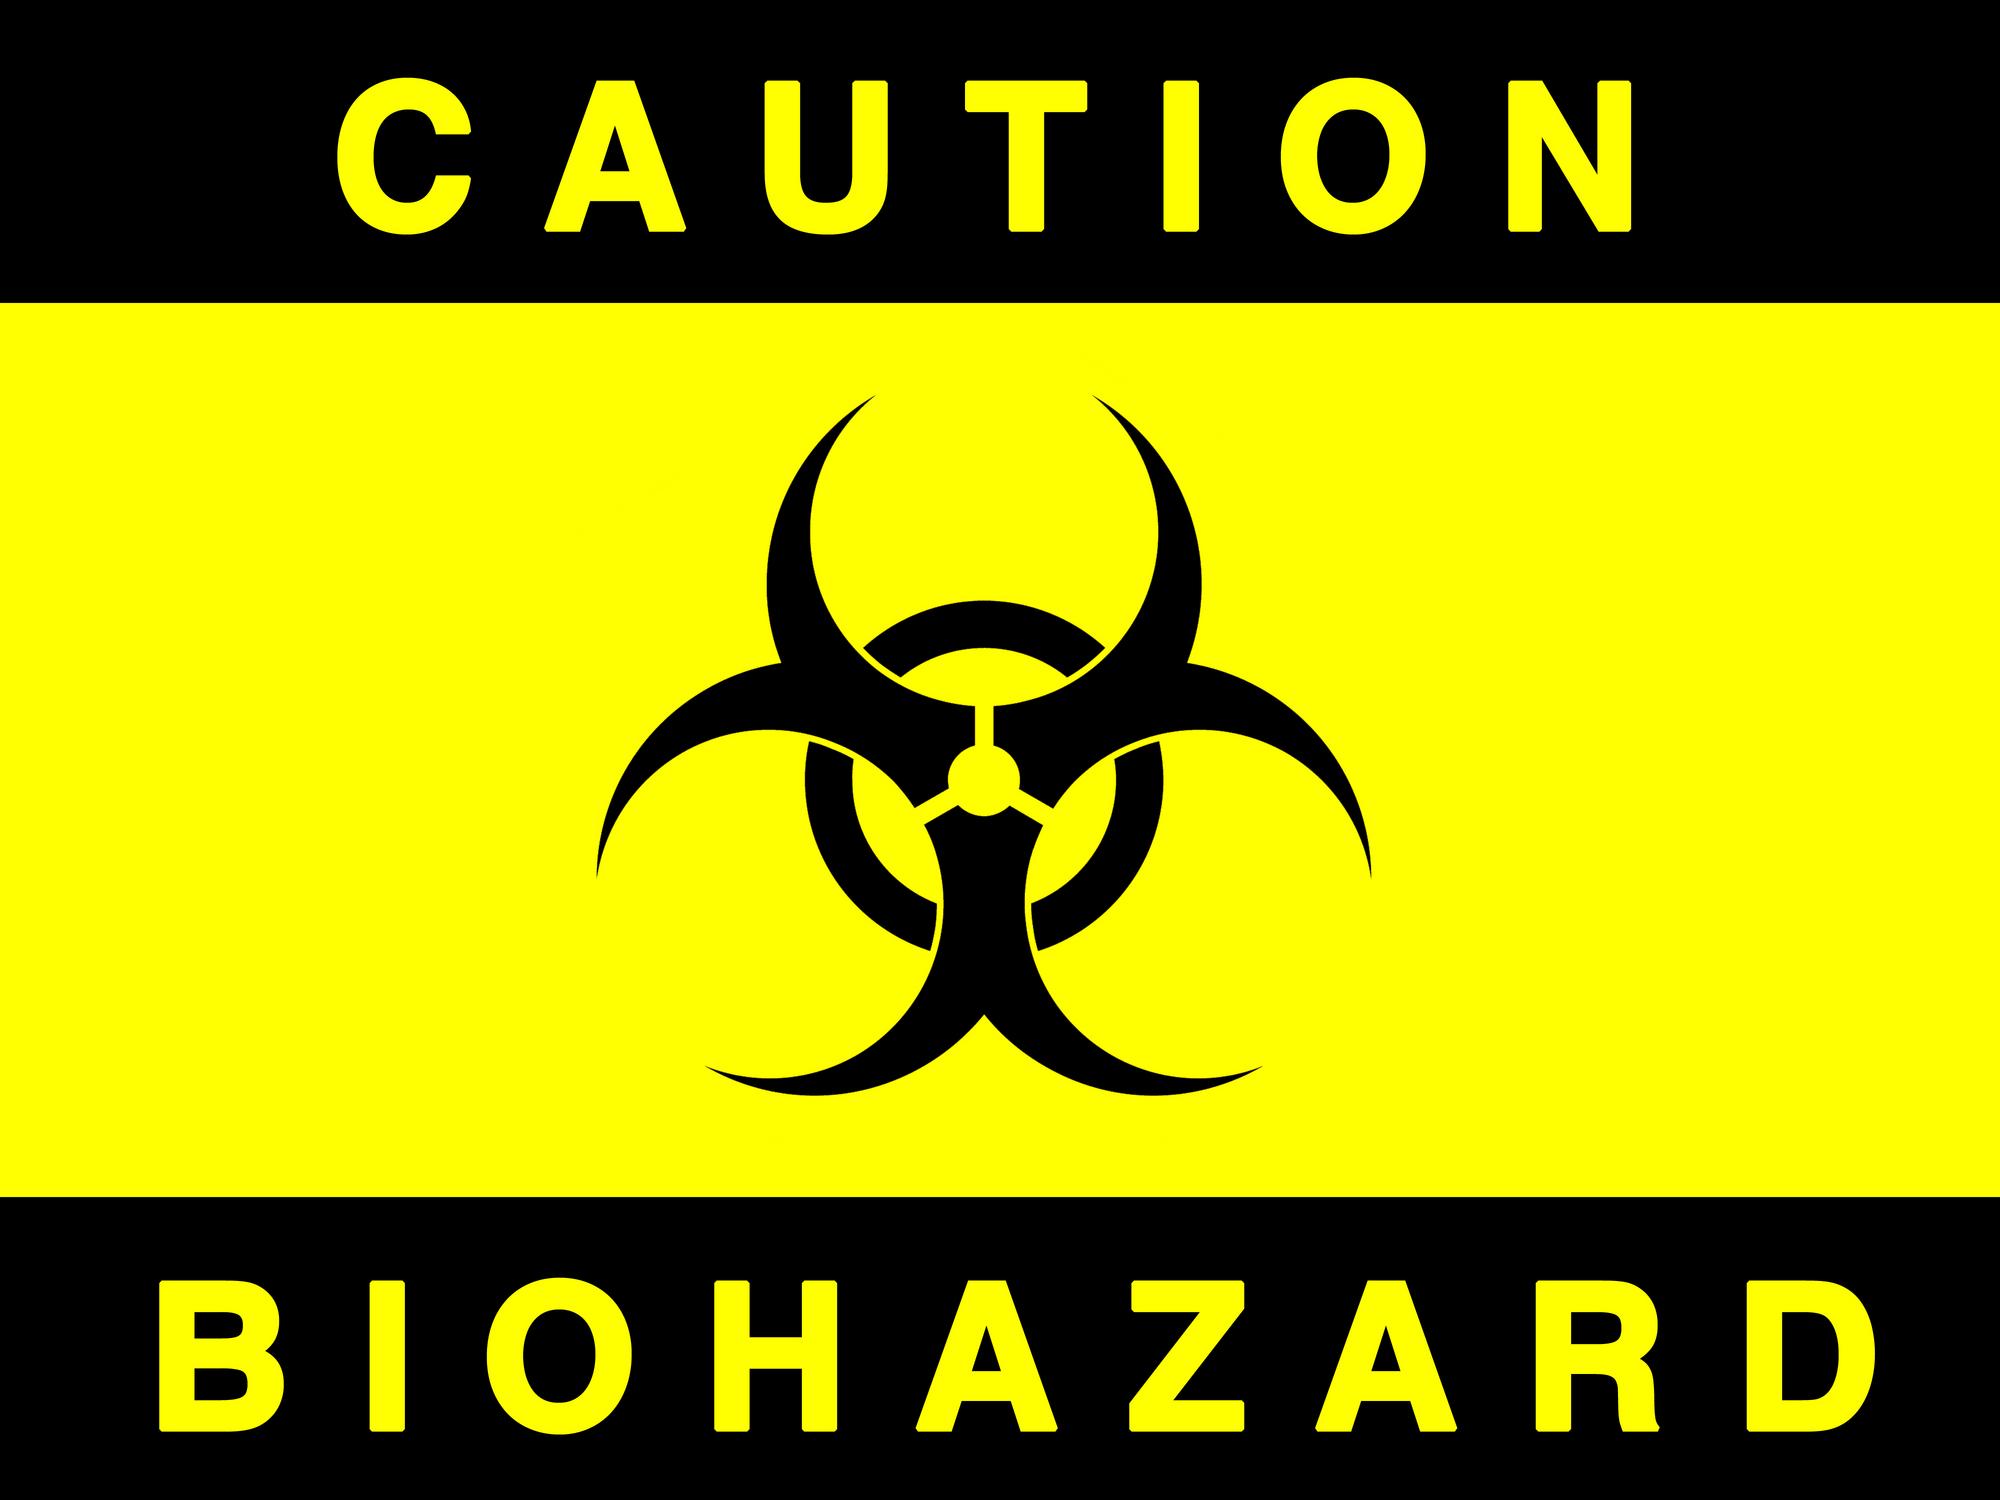 Biohazardsymbolg biohazard symbol view original image at full size biocorpaavc Images